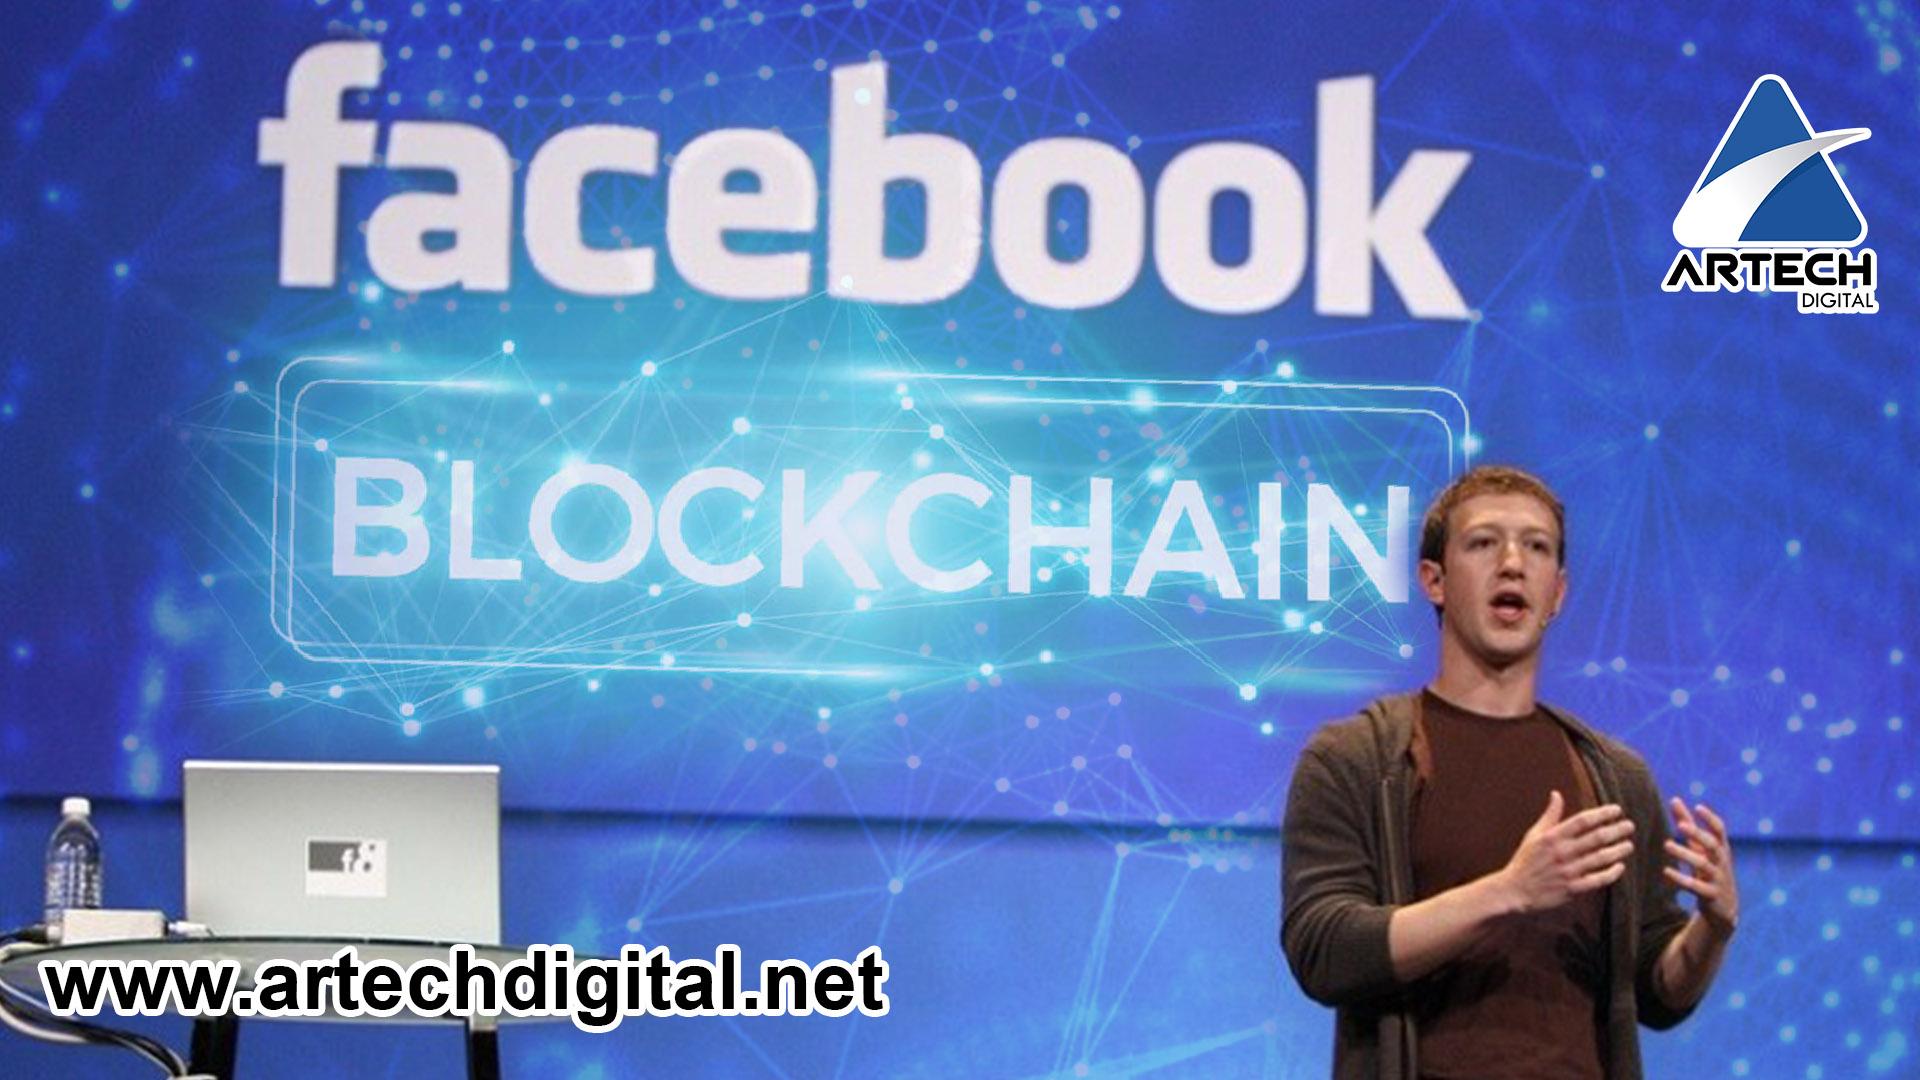 protección de datos con Blockchain - Artech Digital